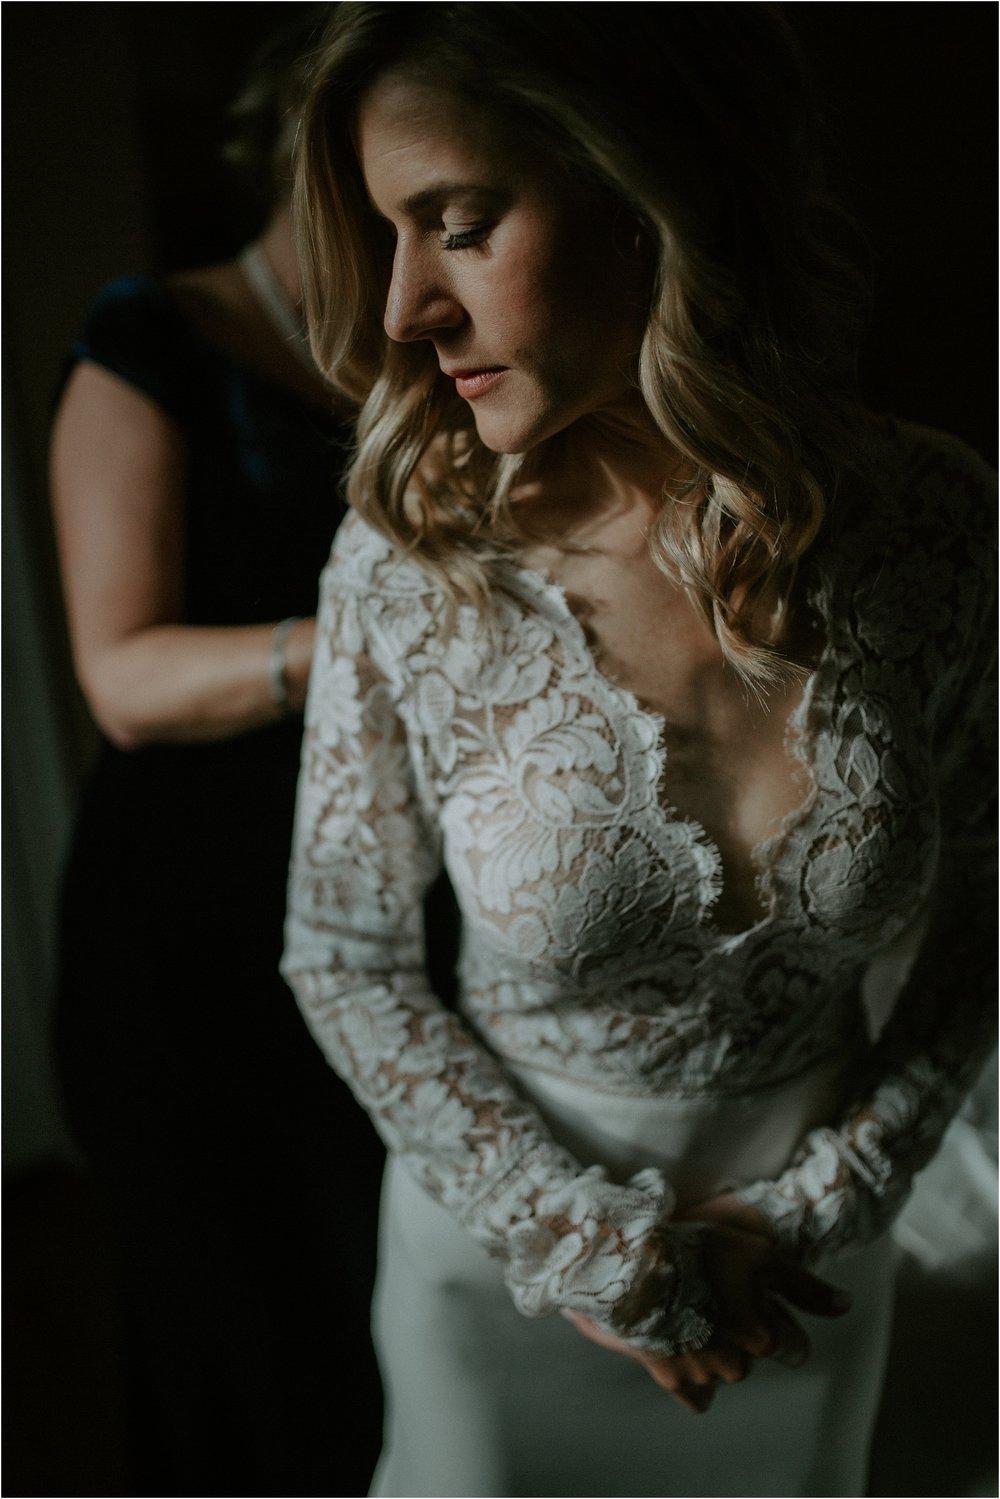 chicago_wedding_photographer_wright_photographs_0083.jpg